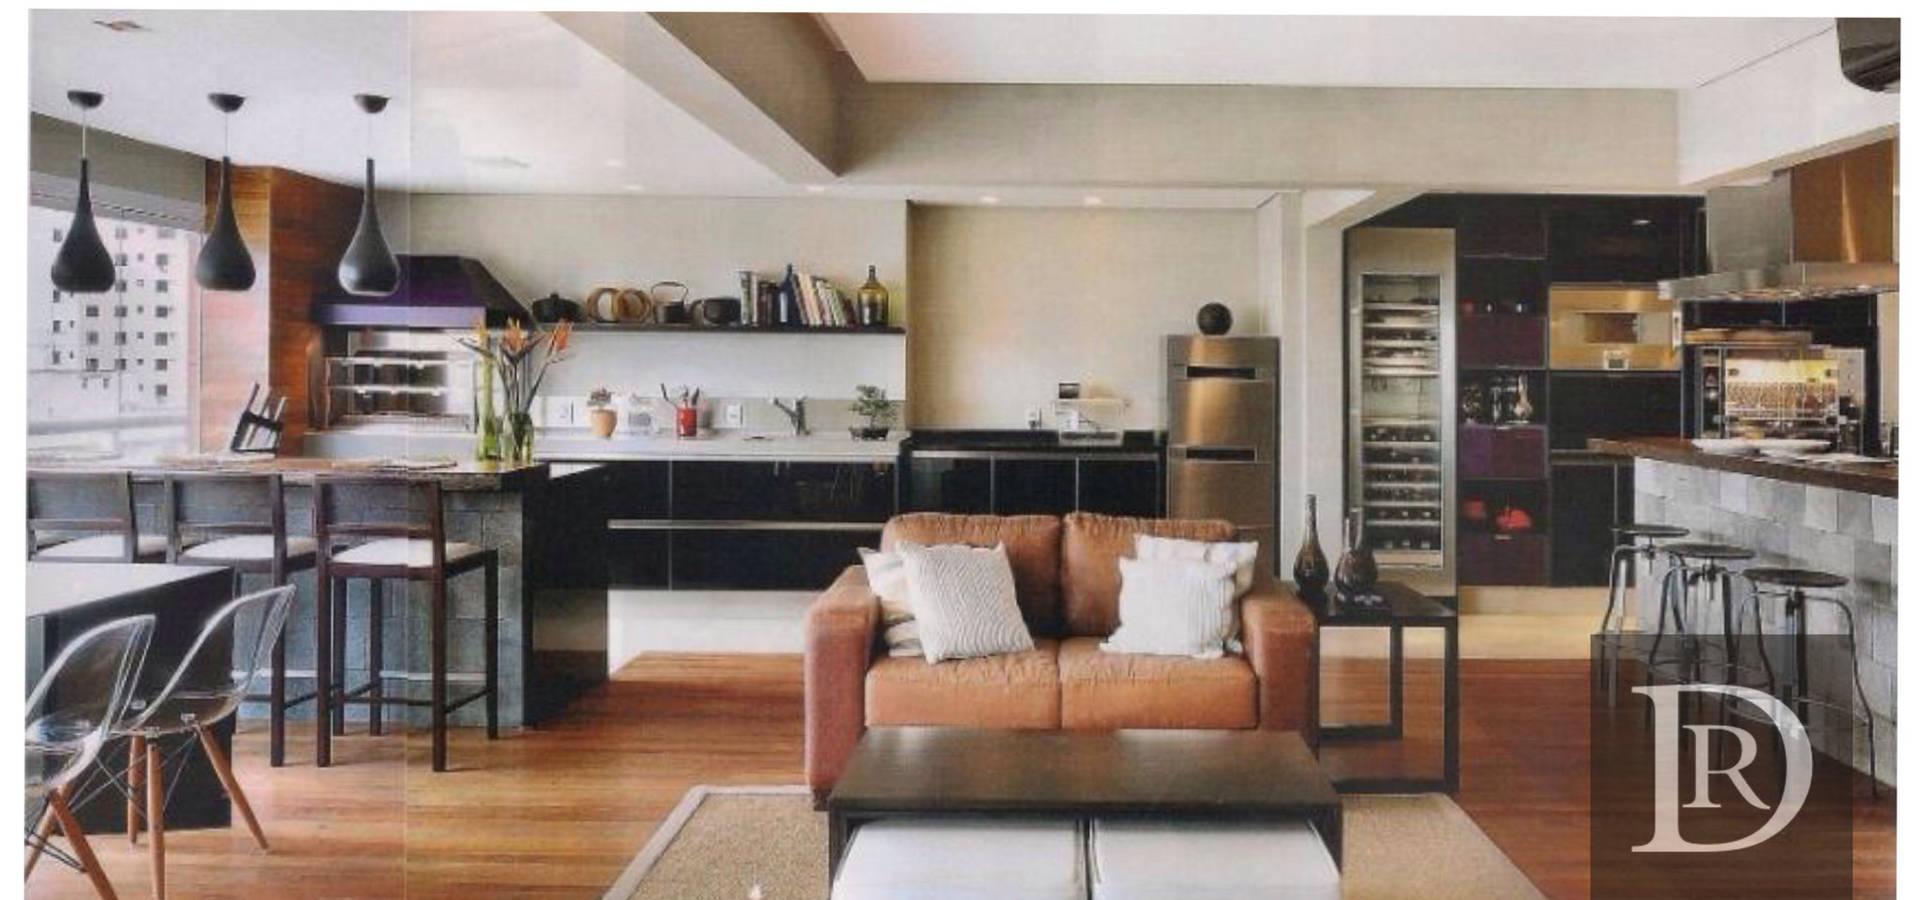 Debora de Rezende   arquitetura e interiores